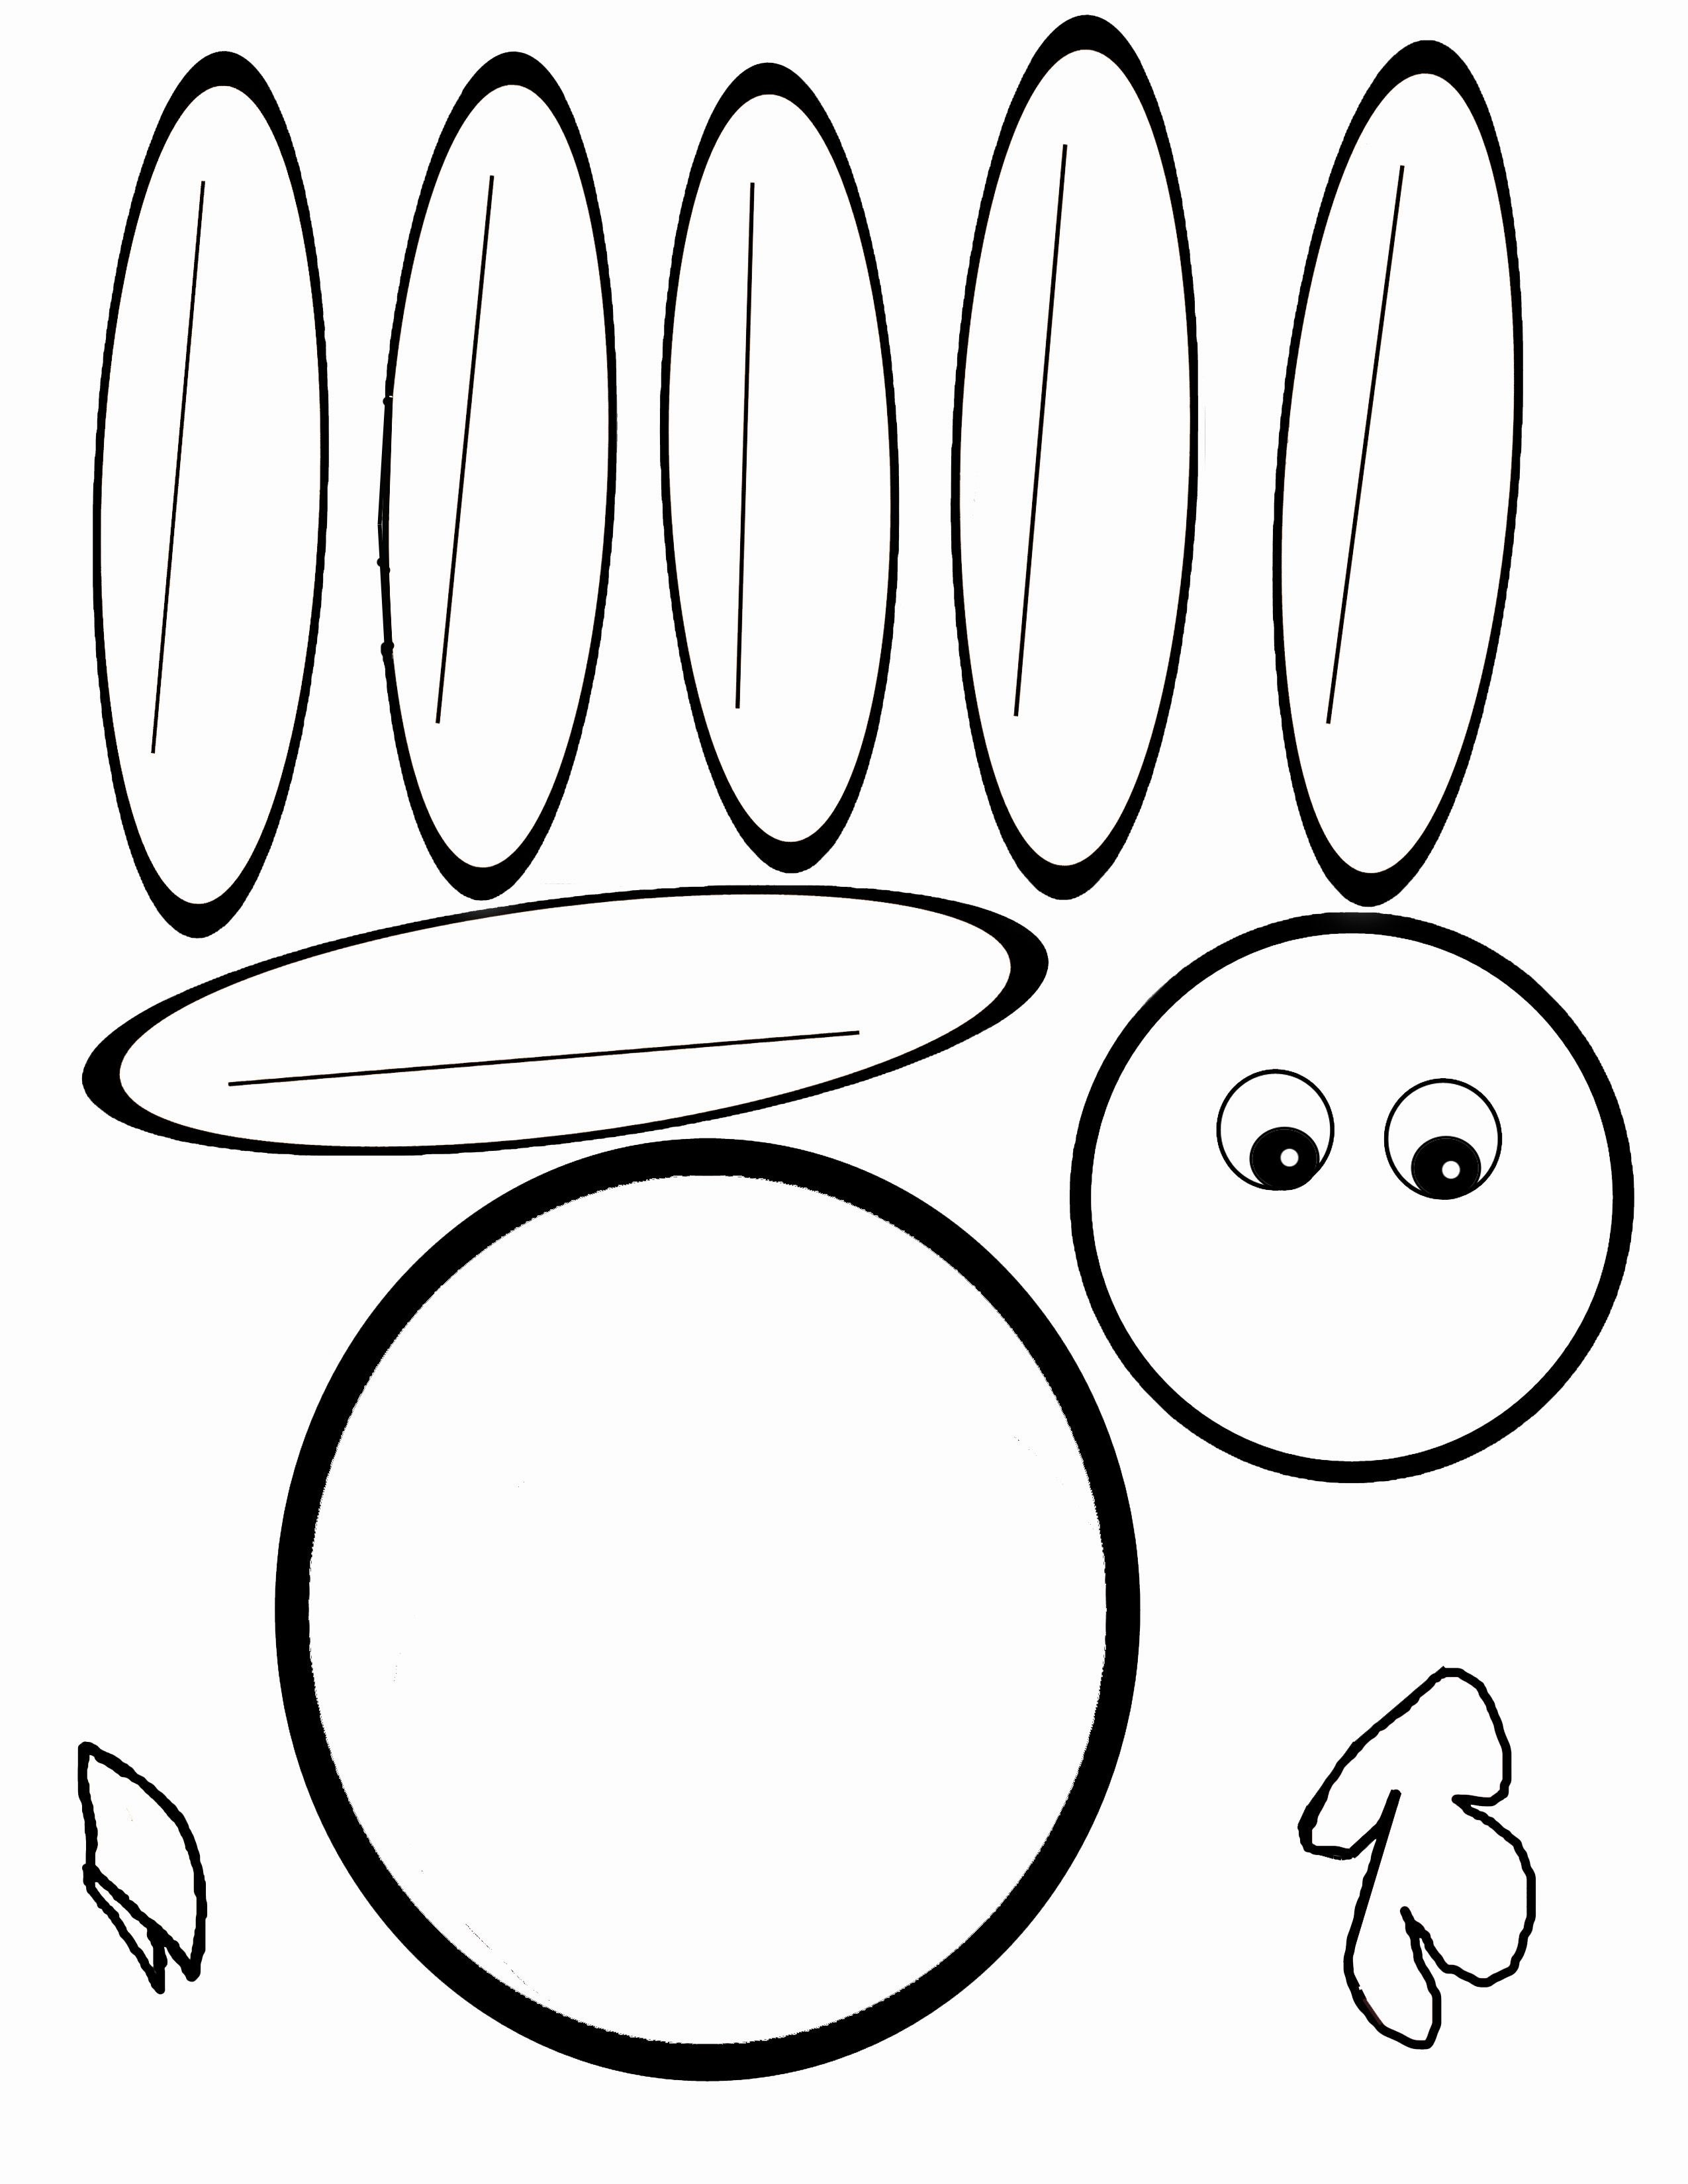 Scissor Cutting Turkey Template  Pediatric Ot  Turkey Template Within Blank Turkey Template